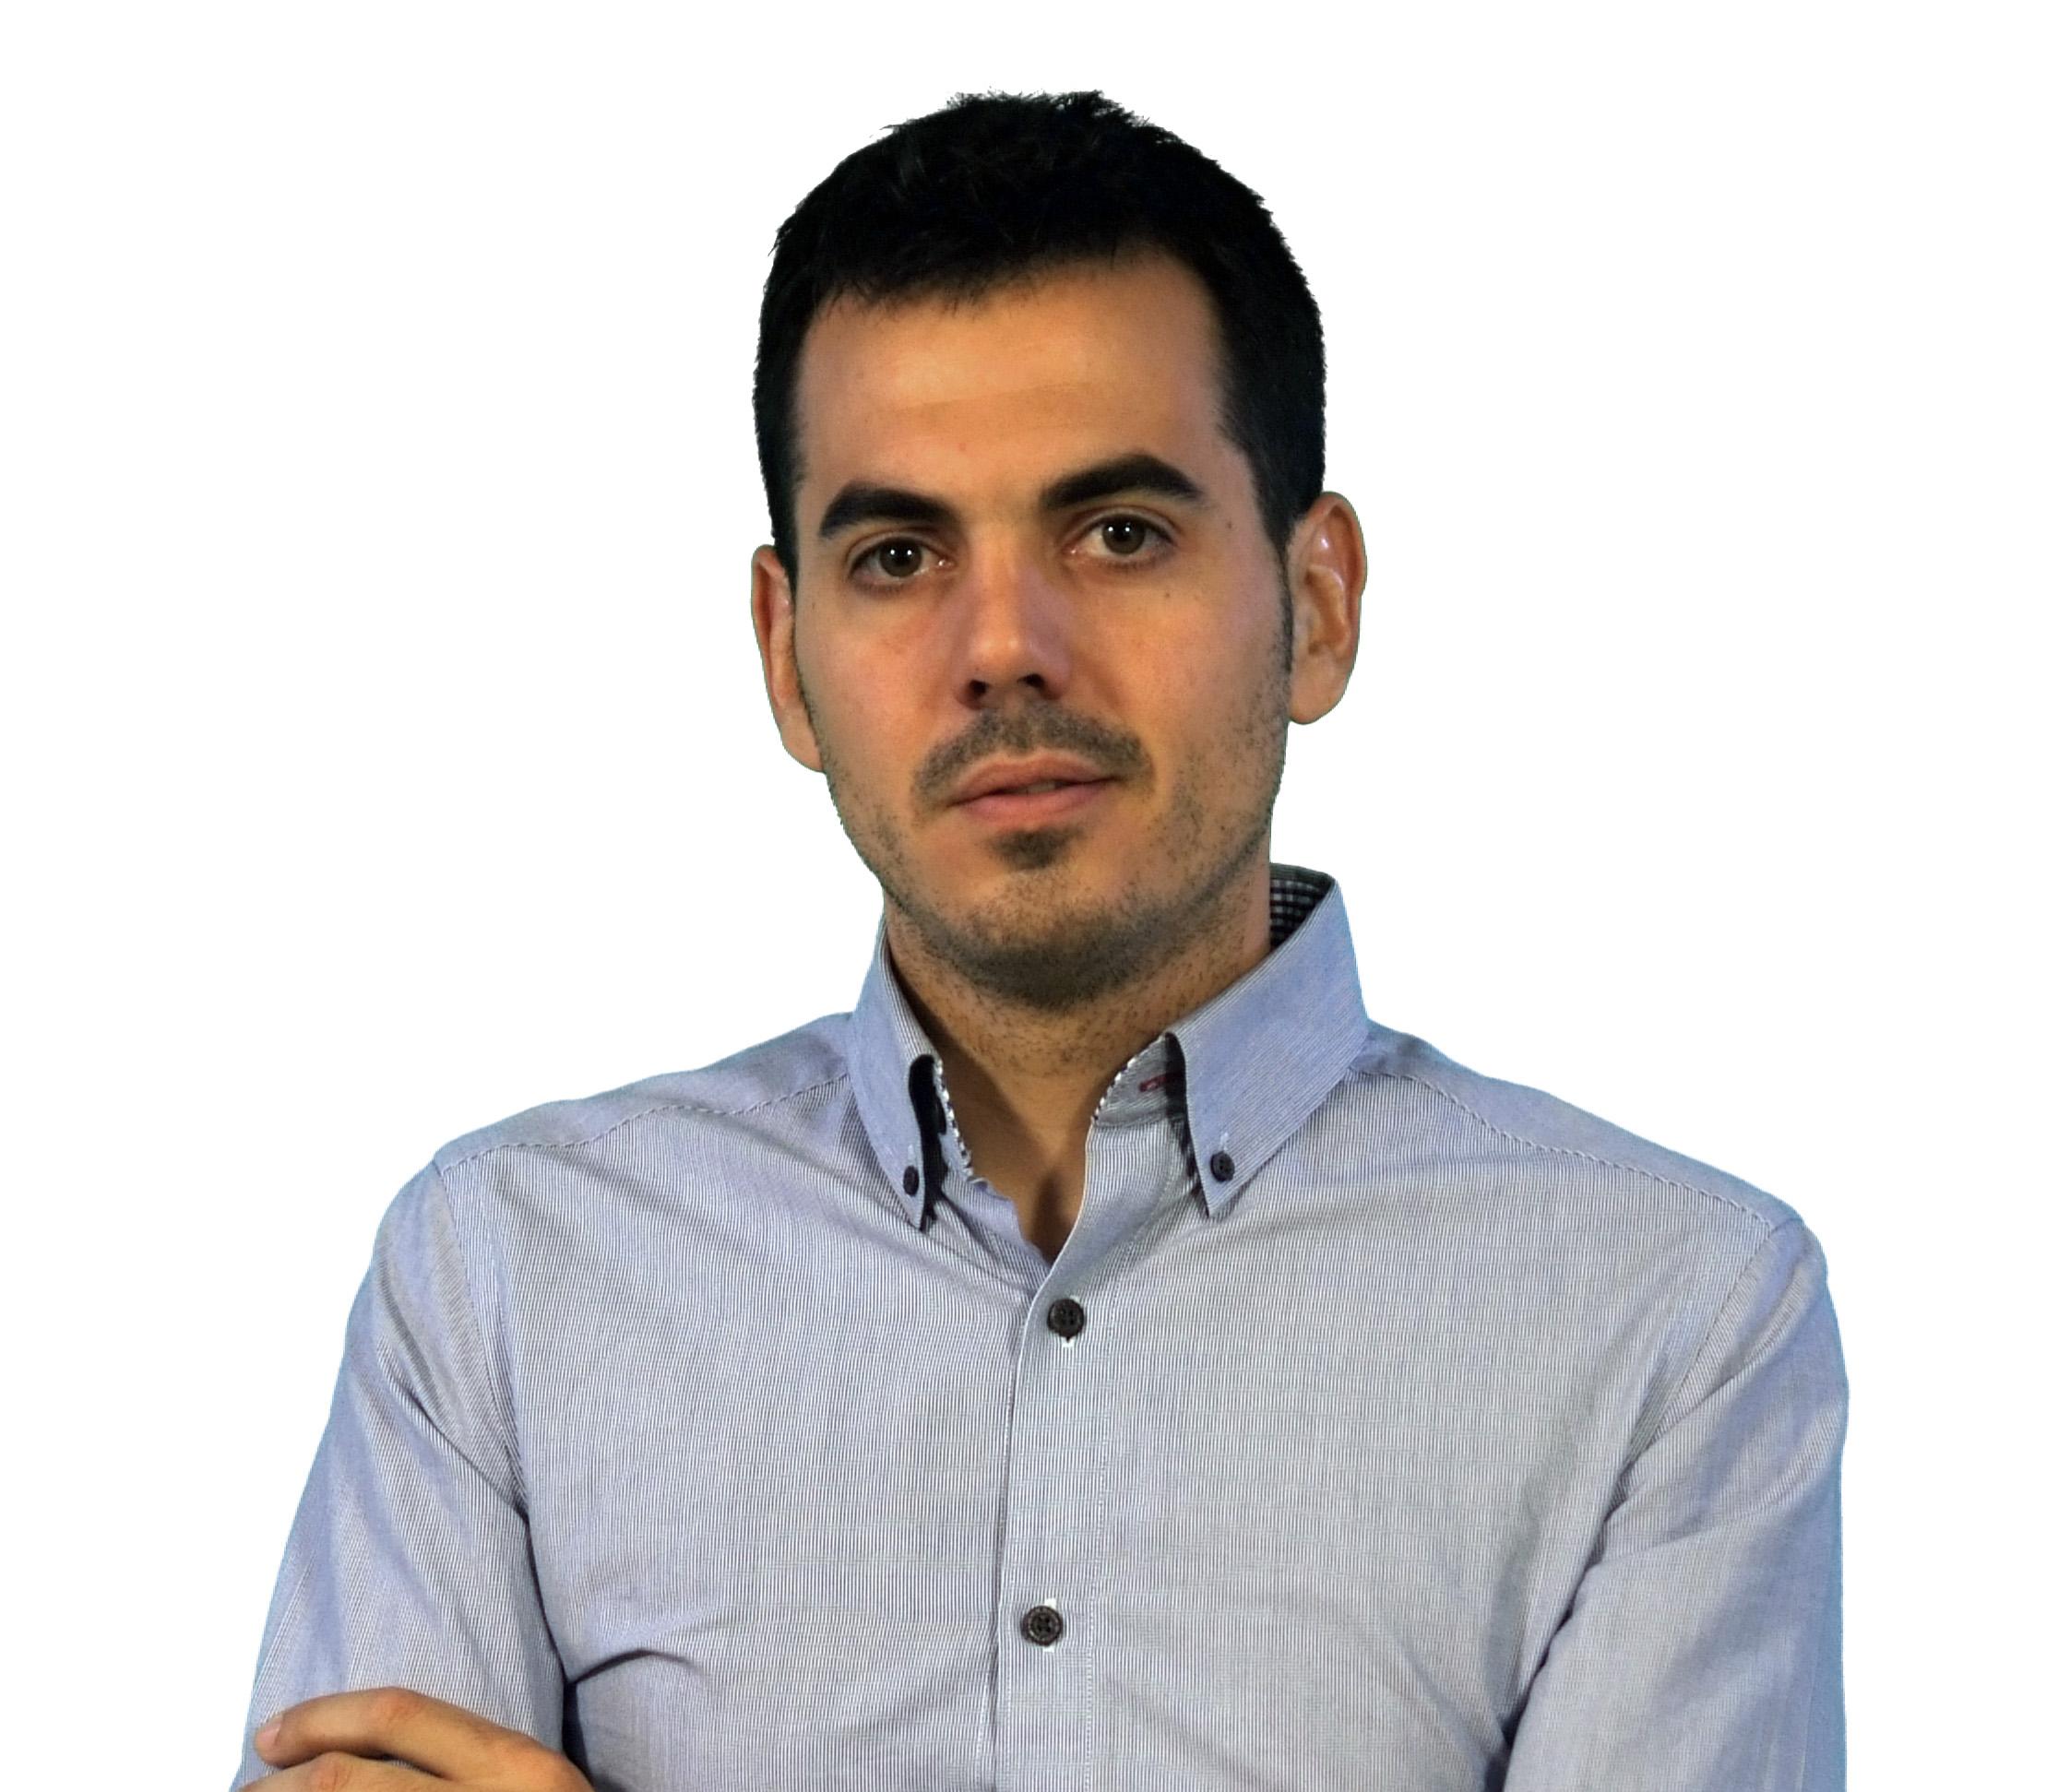 Eduardo Sánchez Segovia